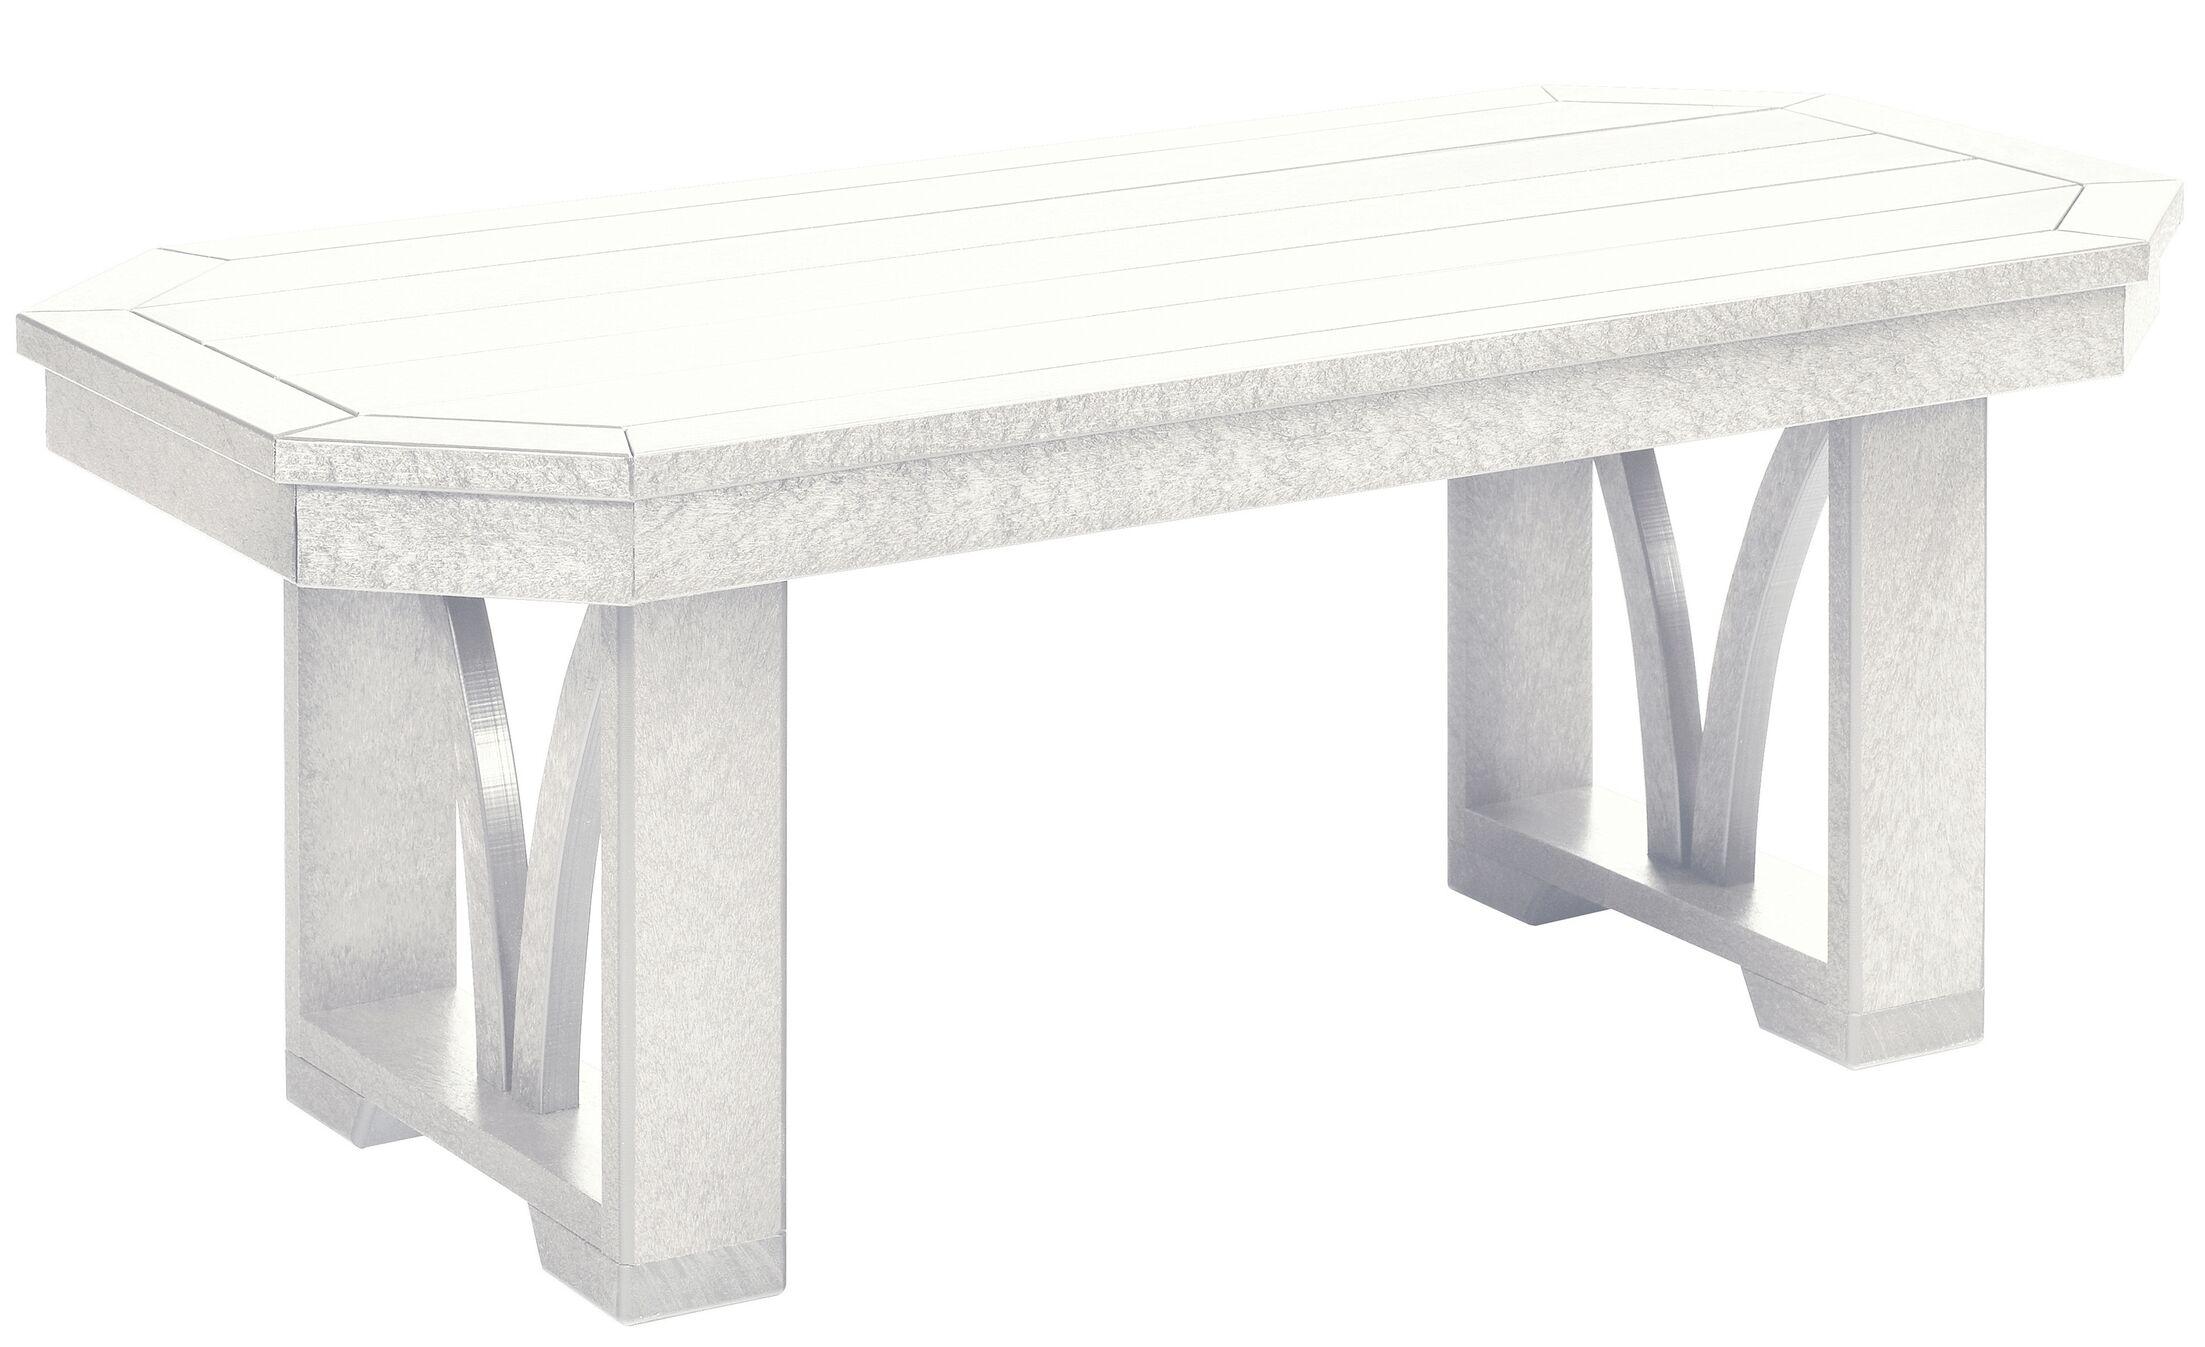 Raja Plastic Coffee Table Color: Slate Gray, Size: 17